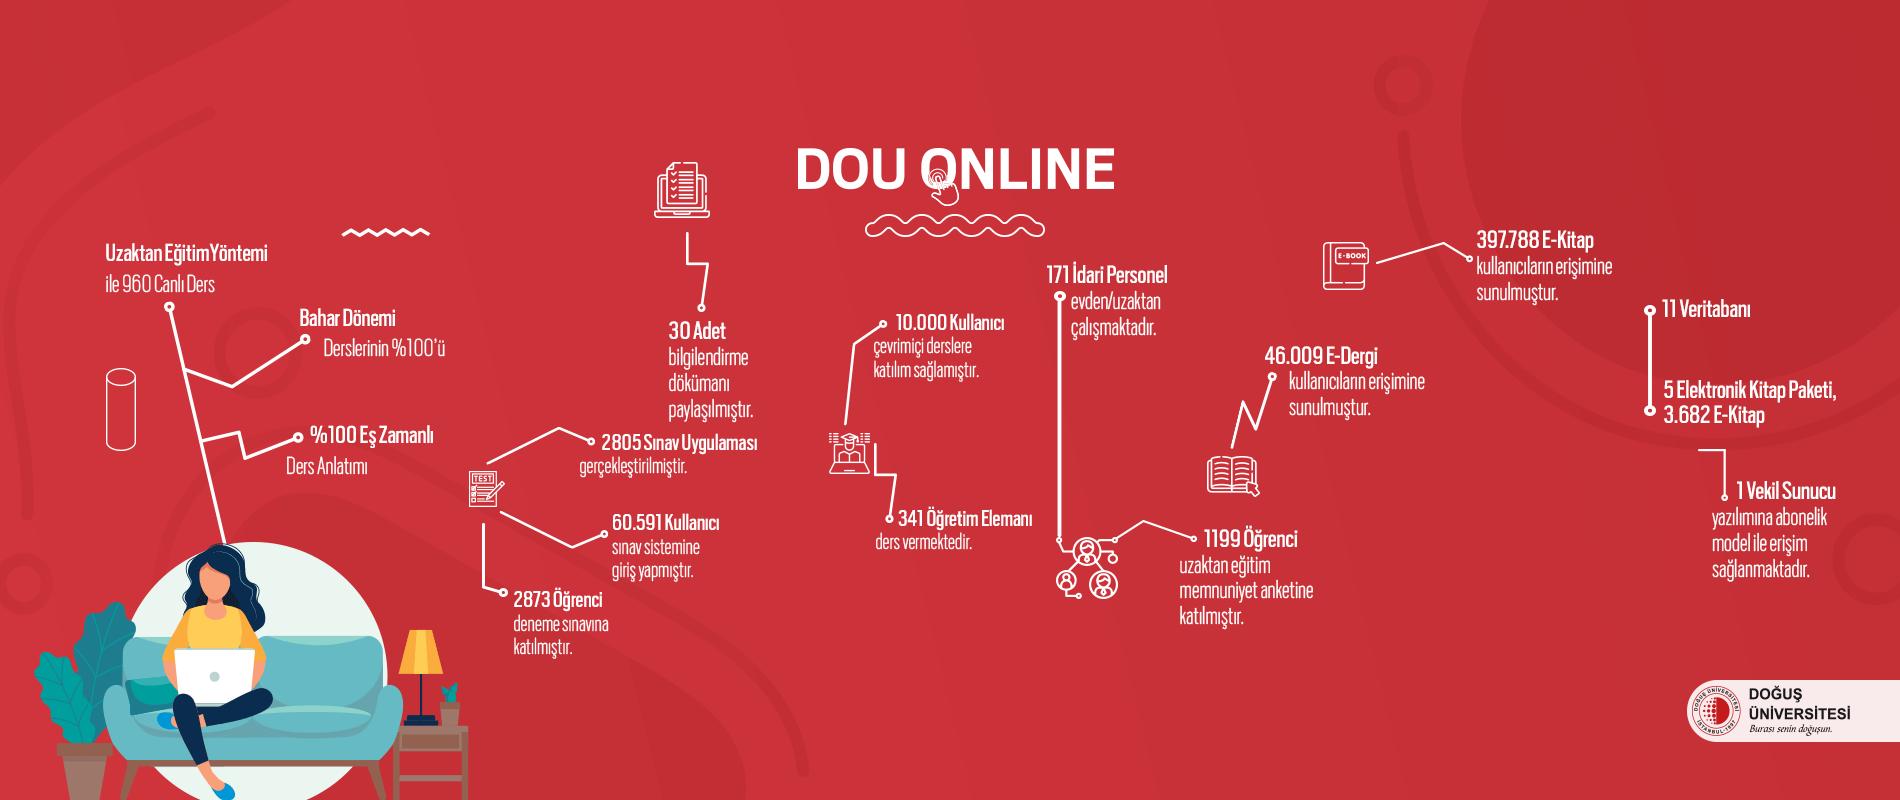 Dou Online 2020